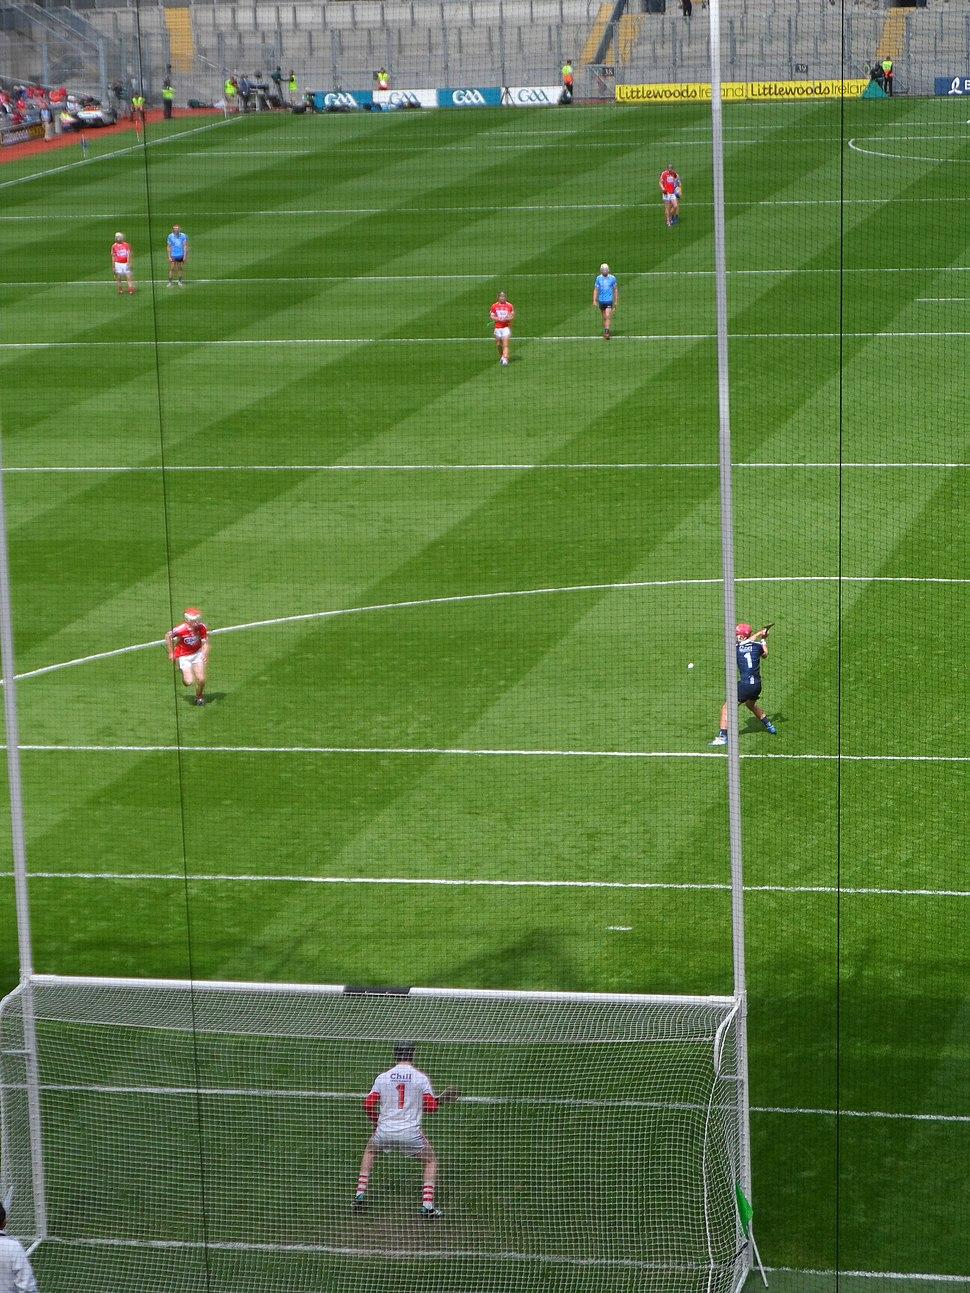 Penalty puck, hurling game